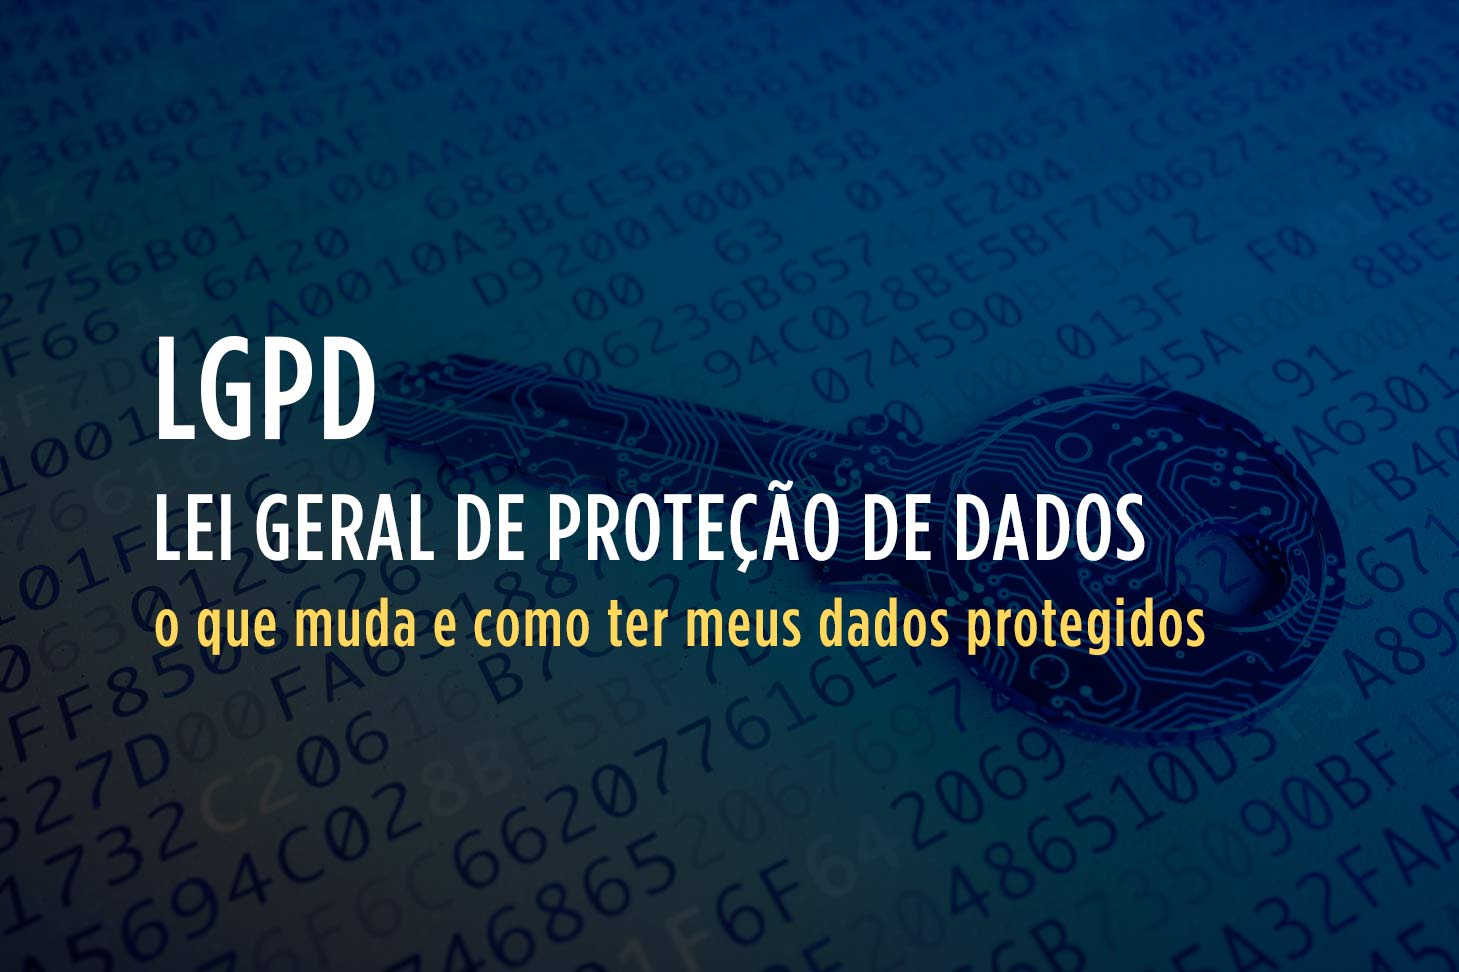 lgpd-lei-geral-de-protecao-de-dados-2